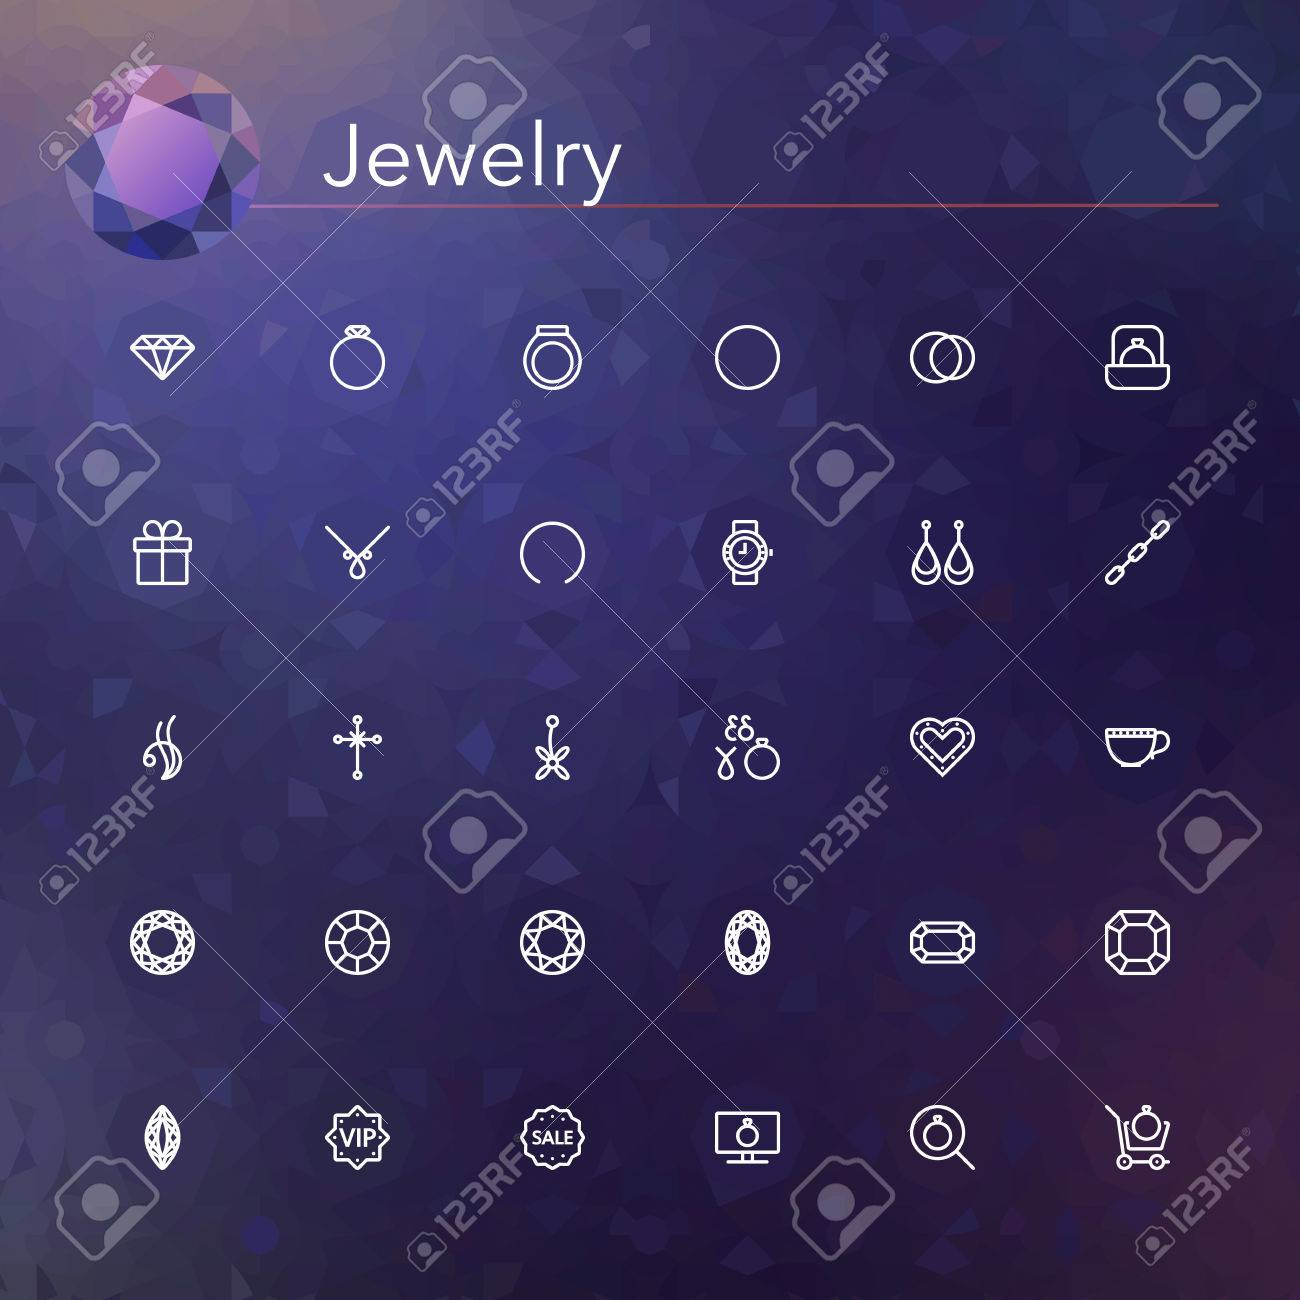 Jewelry line icons set. Vector illustration. - 44376781